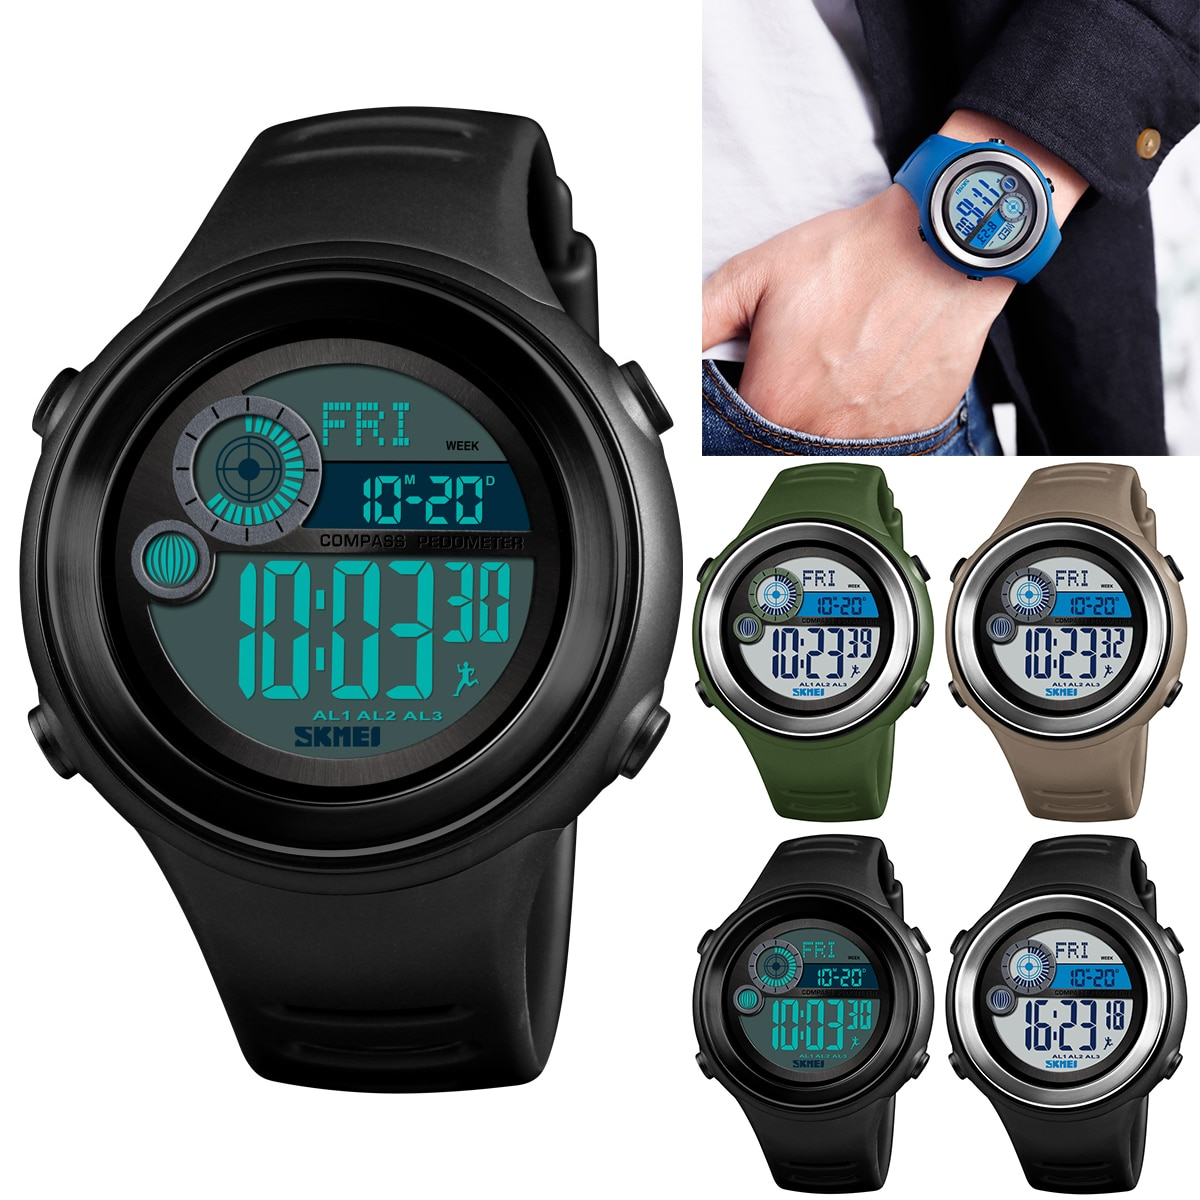 Waterproof Sports Digital Watch EL Luminous Backlight Wristwatch Date & Week Display 12/24 Hour Compass Pedometer Calories